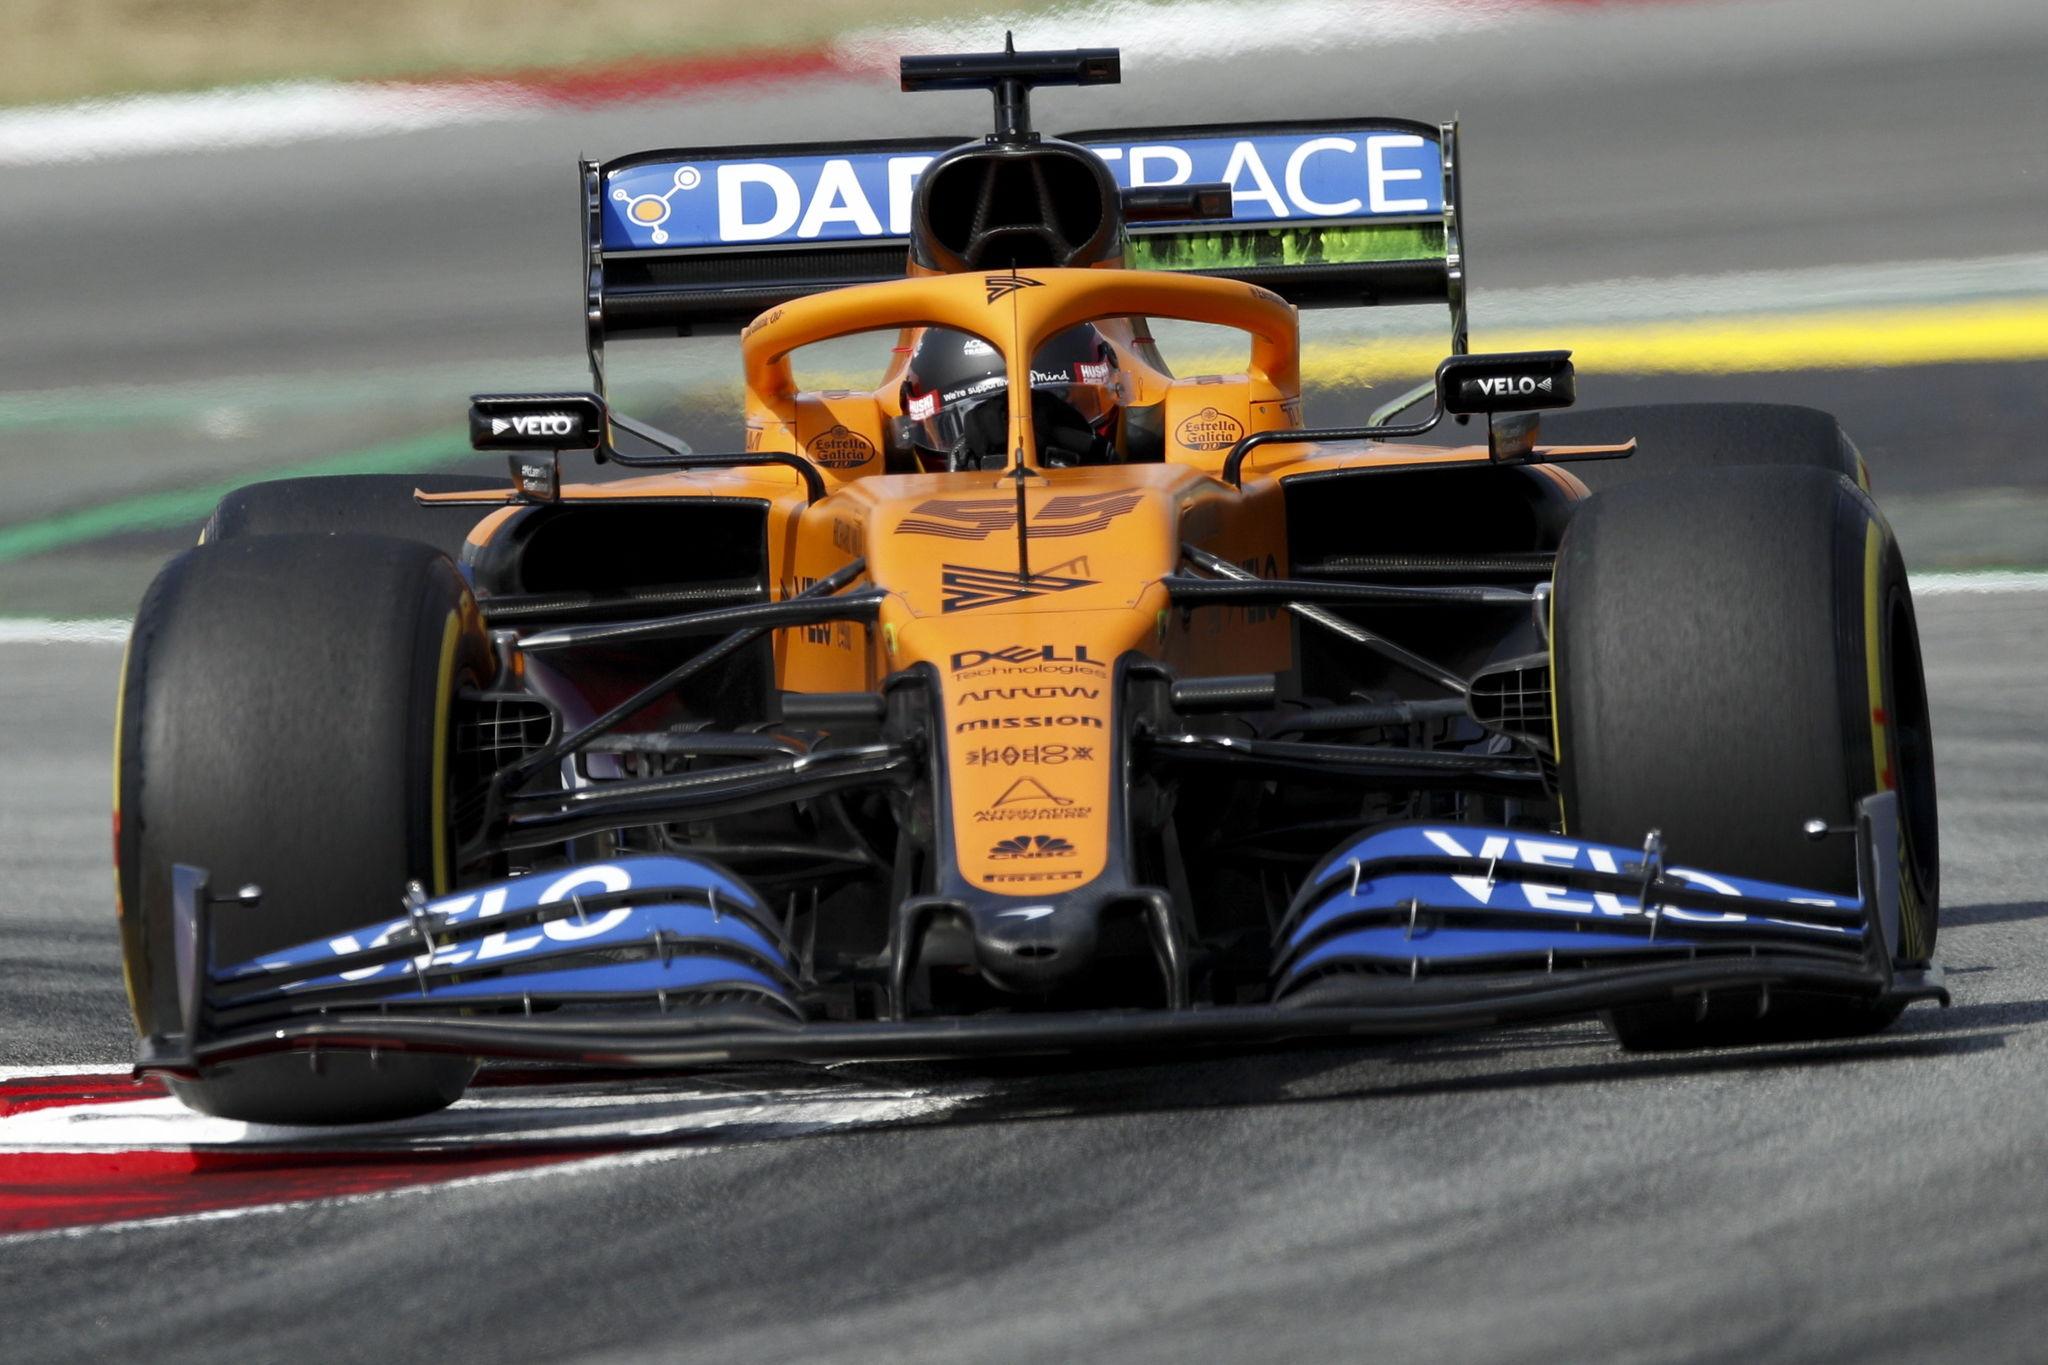 Montmelo (Spain), 14/08/2020.- Spanish Formula One driver lt;HIT gt;Carlos lt;/HIT gt; lt;HIT gt;Sainz lt;/HIT gt; of McLaren in action during the first practice of the Formula One Grand Prix of Spain at the Circuit de Barcelona-Catalunya in Montmelo, Spain, 14 August 2020. The 2020 Formula One Grand Prix of Spain will take place on 16 August 2020. (Fórmula Uno, España) EFE/EPA/Albert Gea / POOL